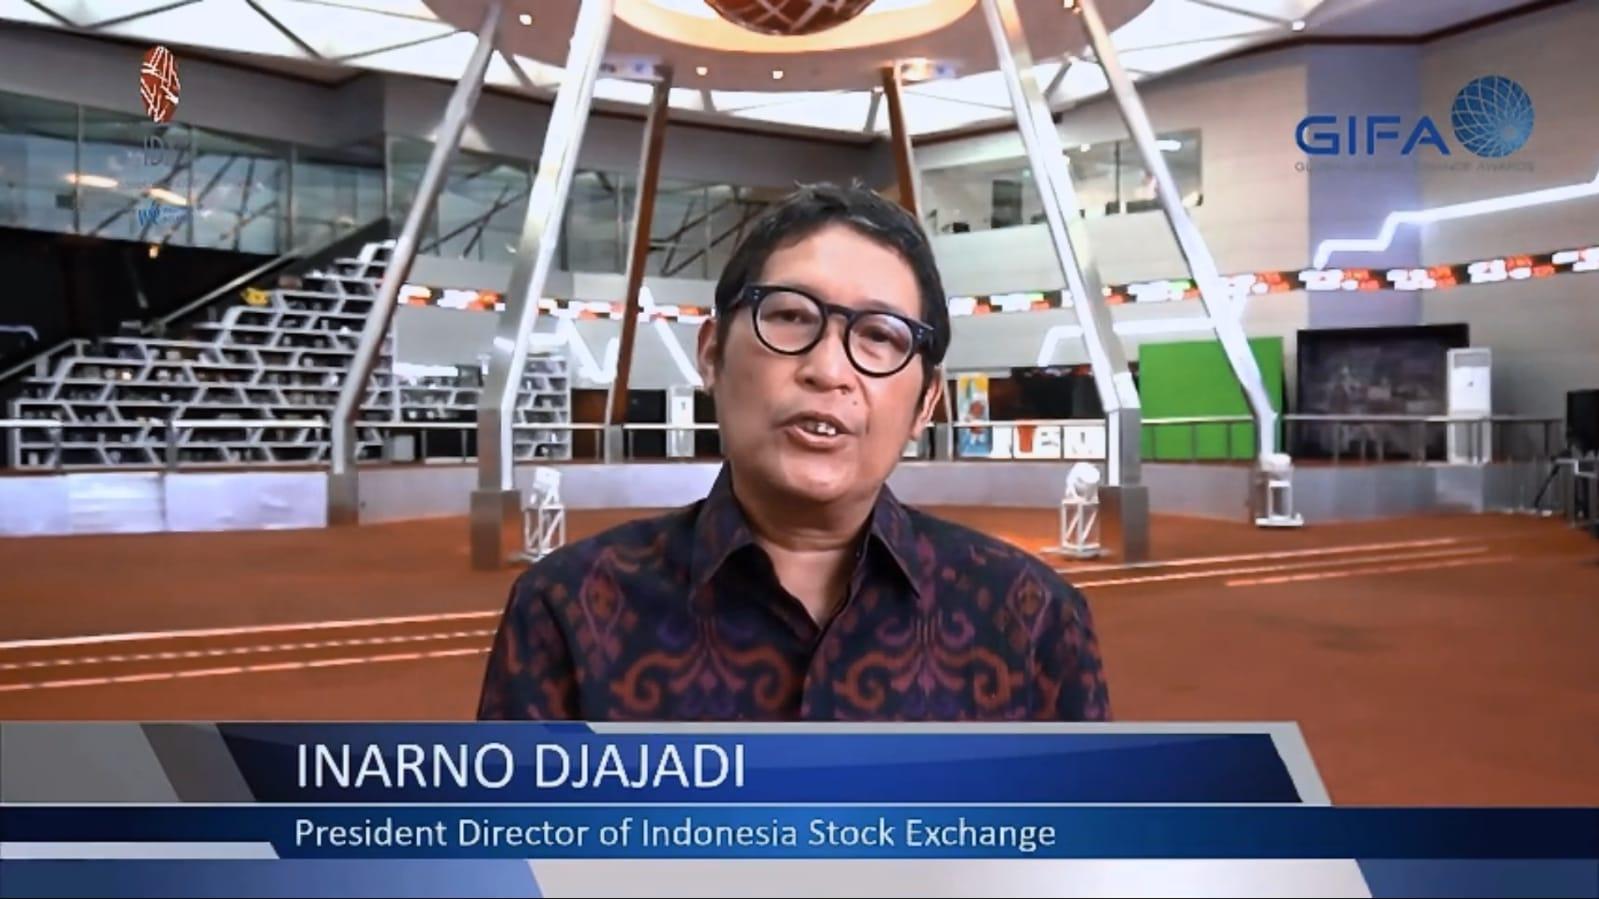 BEI Cetak Hat-Trick The Best Islamic Capital Market di Ajang GIFA 2021